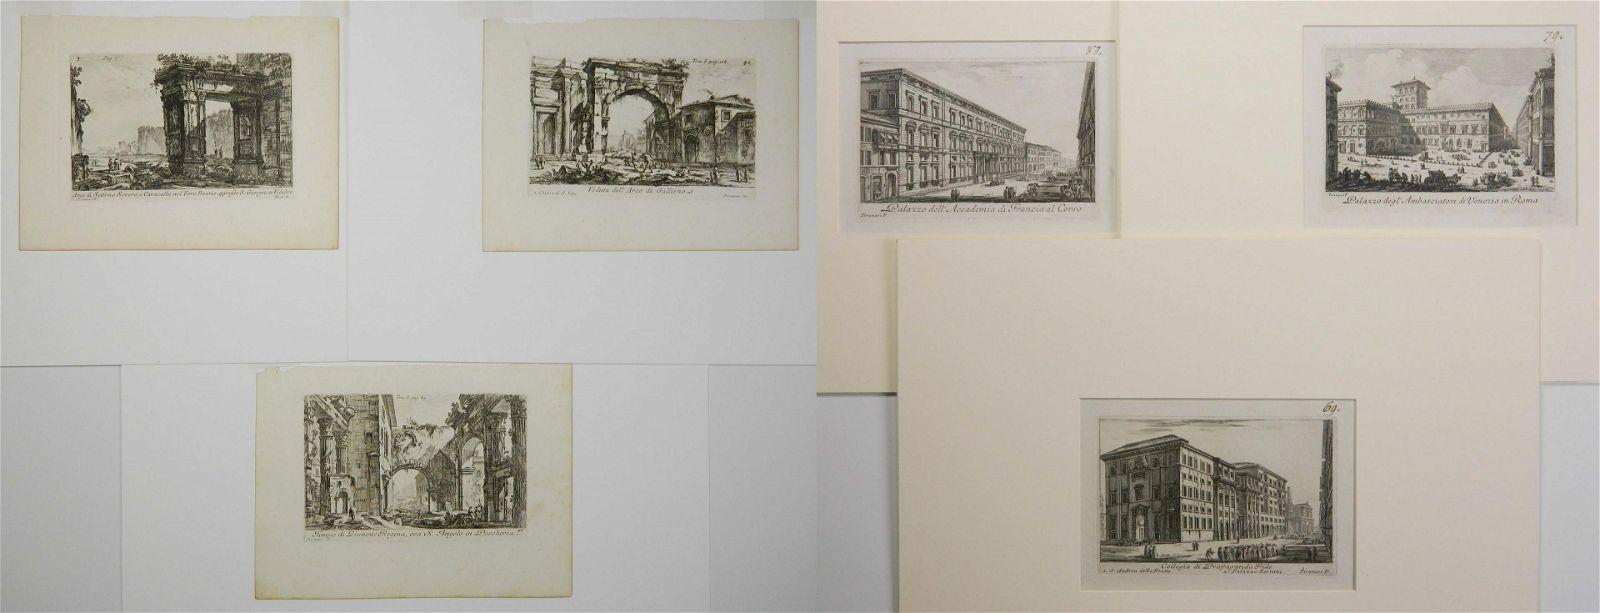 6 Giovanni B. Piranesi etchings